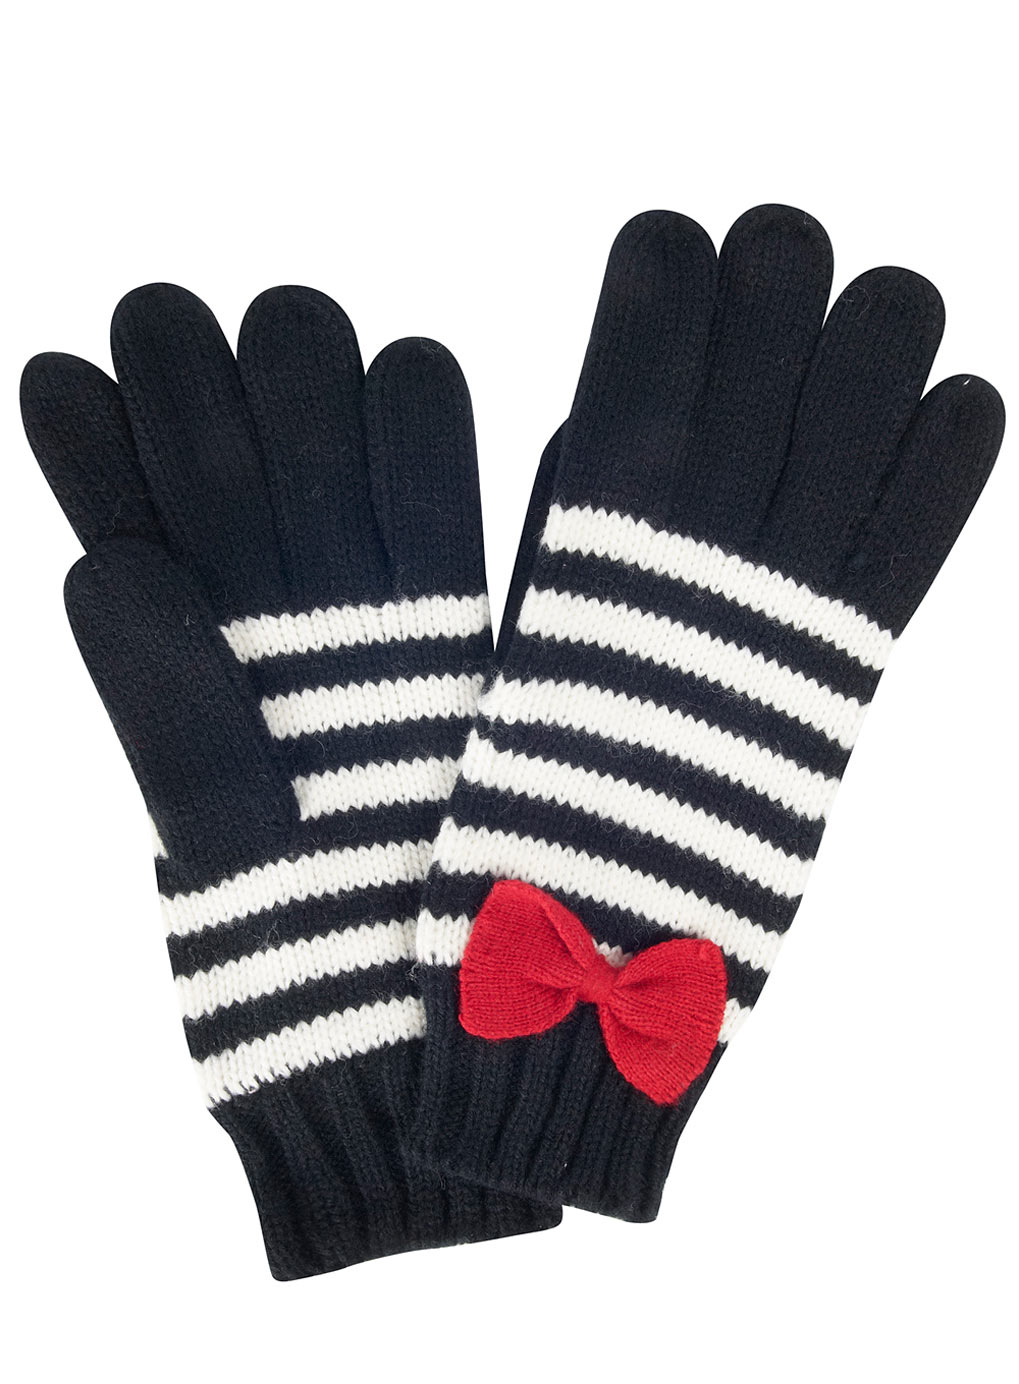 Stripe gloves.   Back